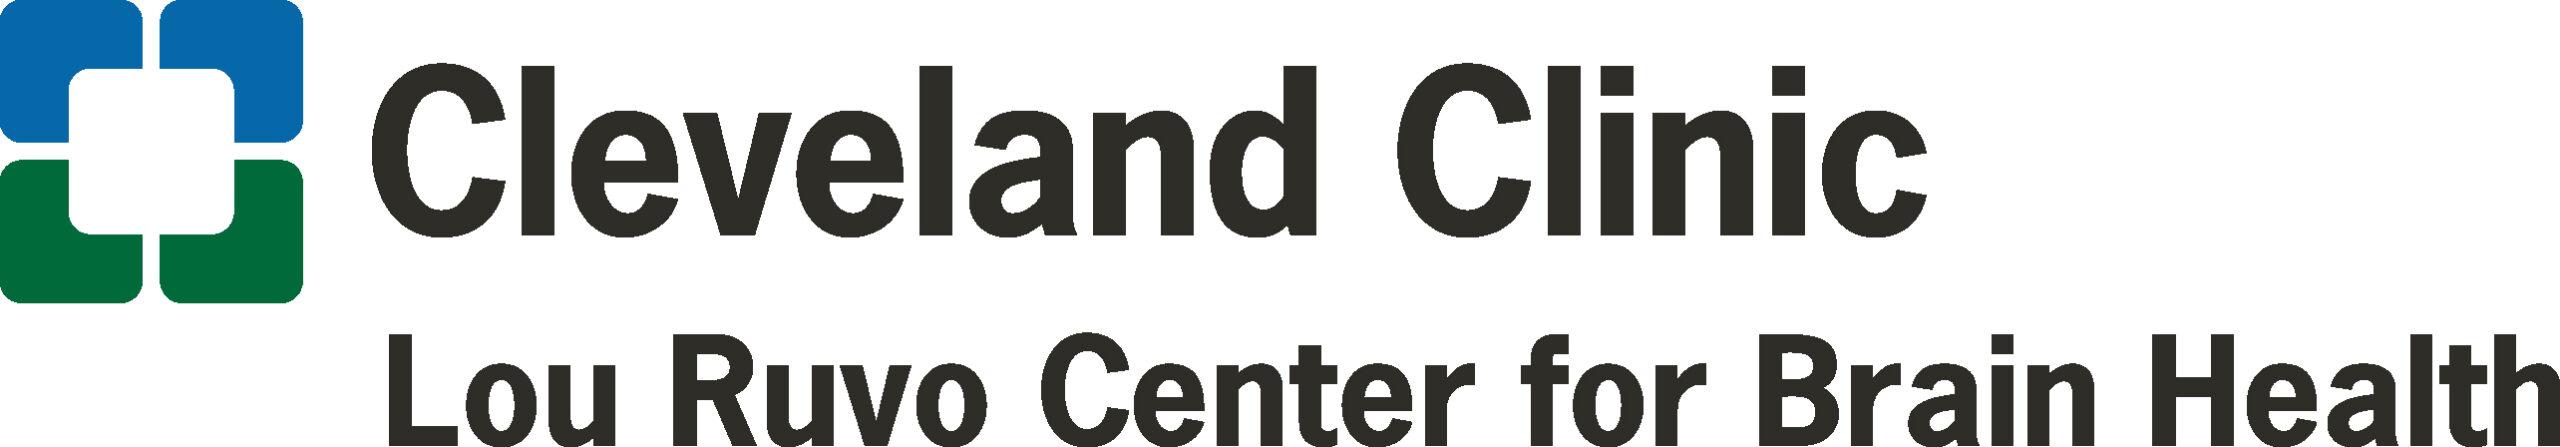 Cleveland Clinic Education Nevada